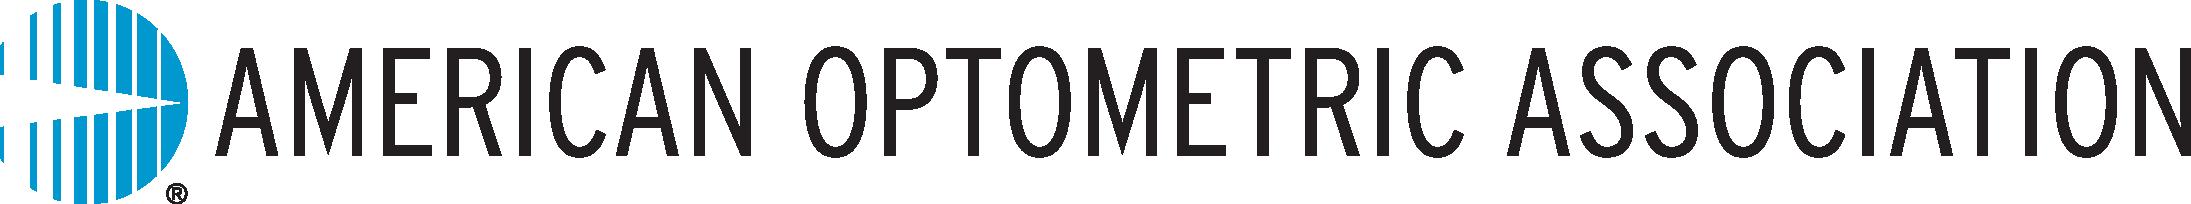 American Optometric Association logo